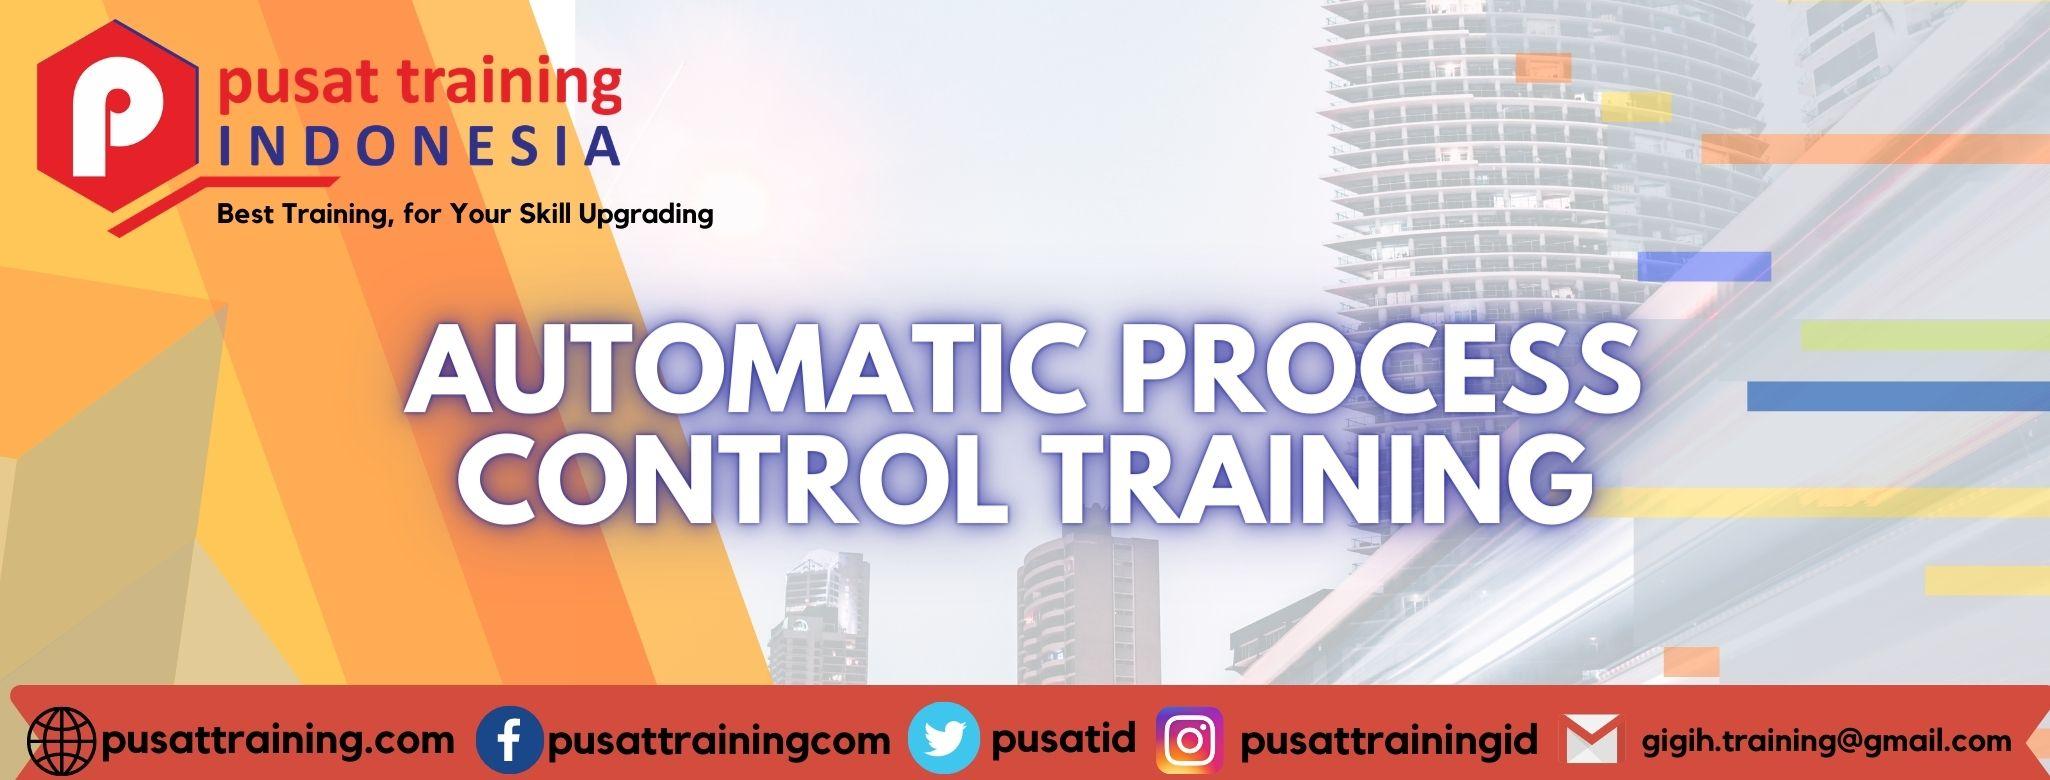 AUTOMATIC PROCESS CONTROL TRAINING